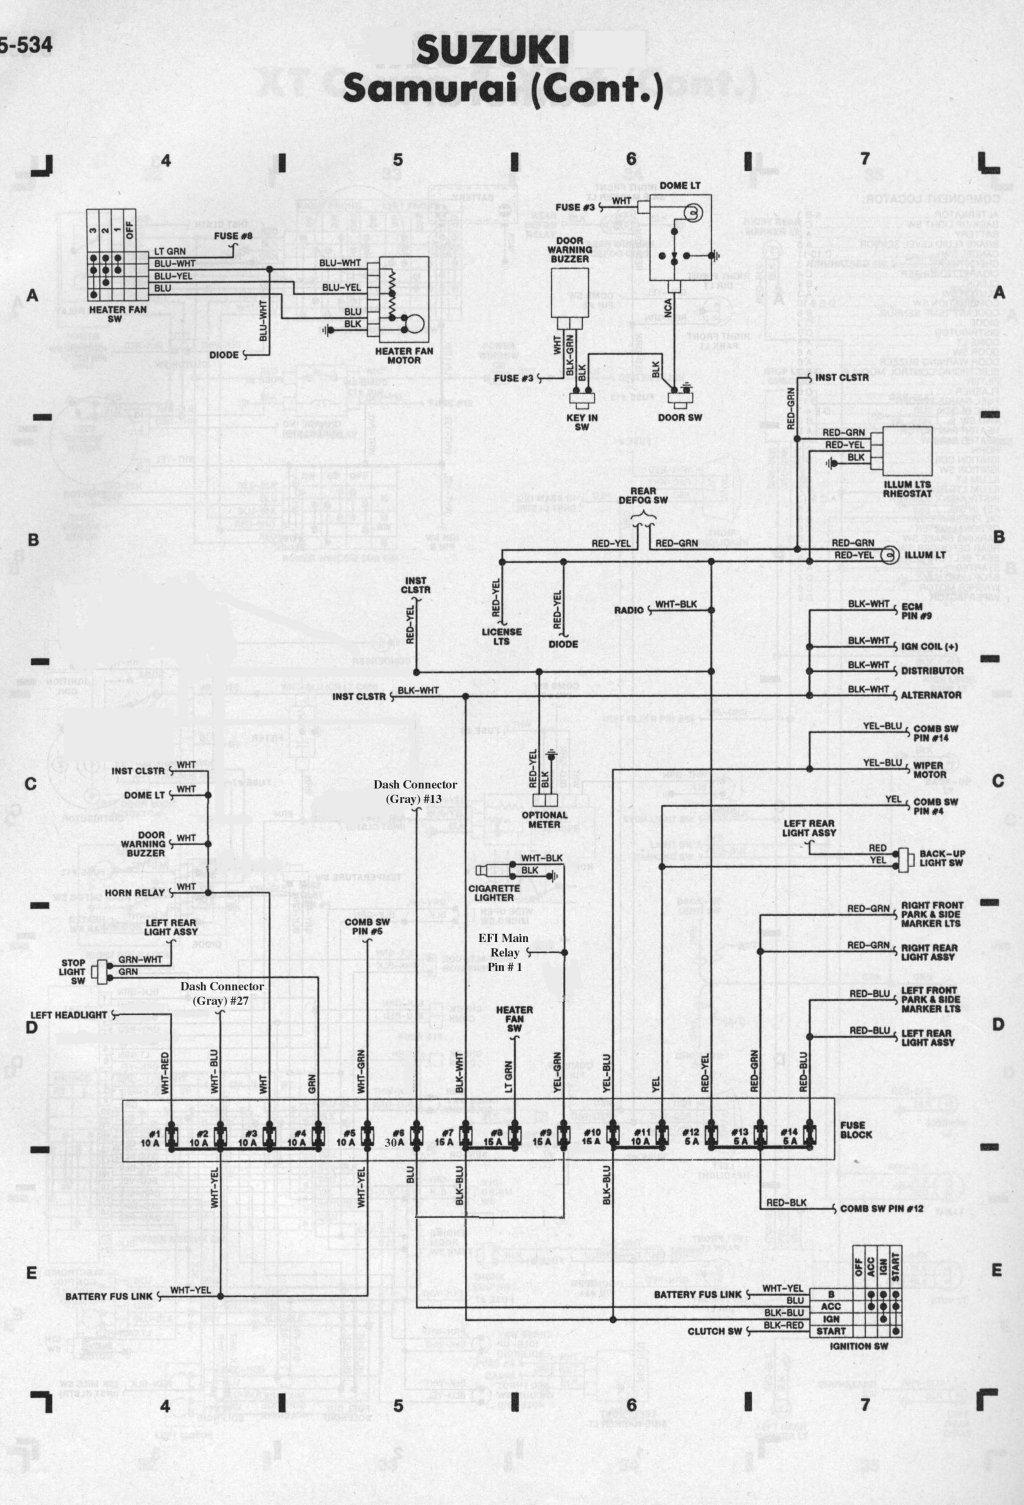 schema impianto elettrico sj 410